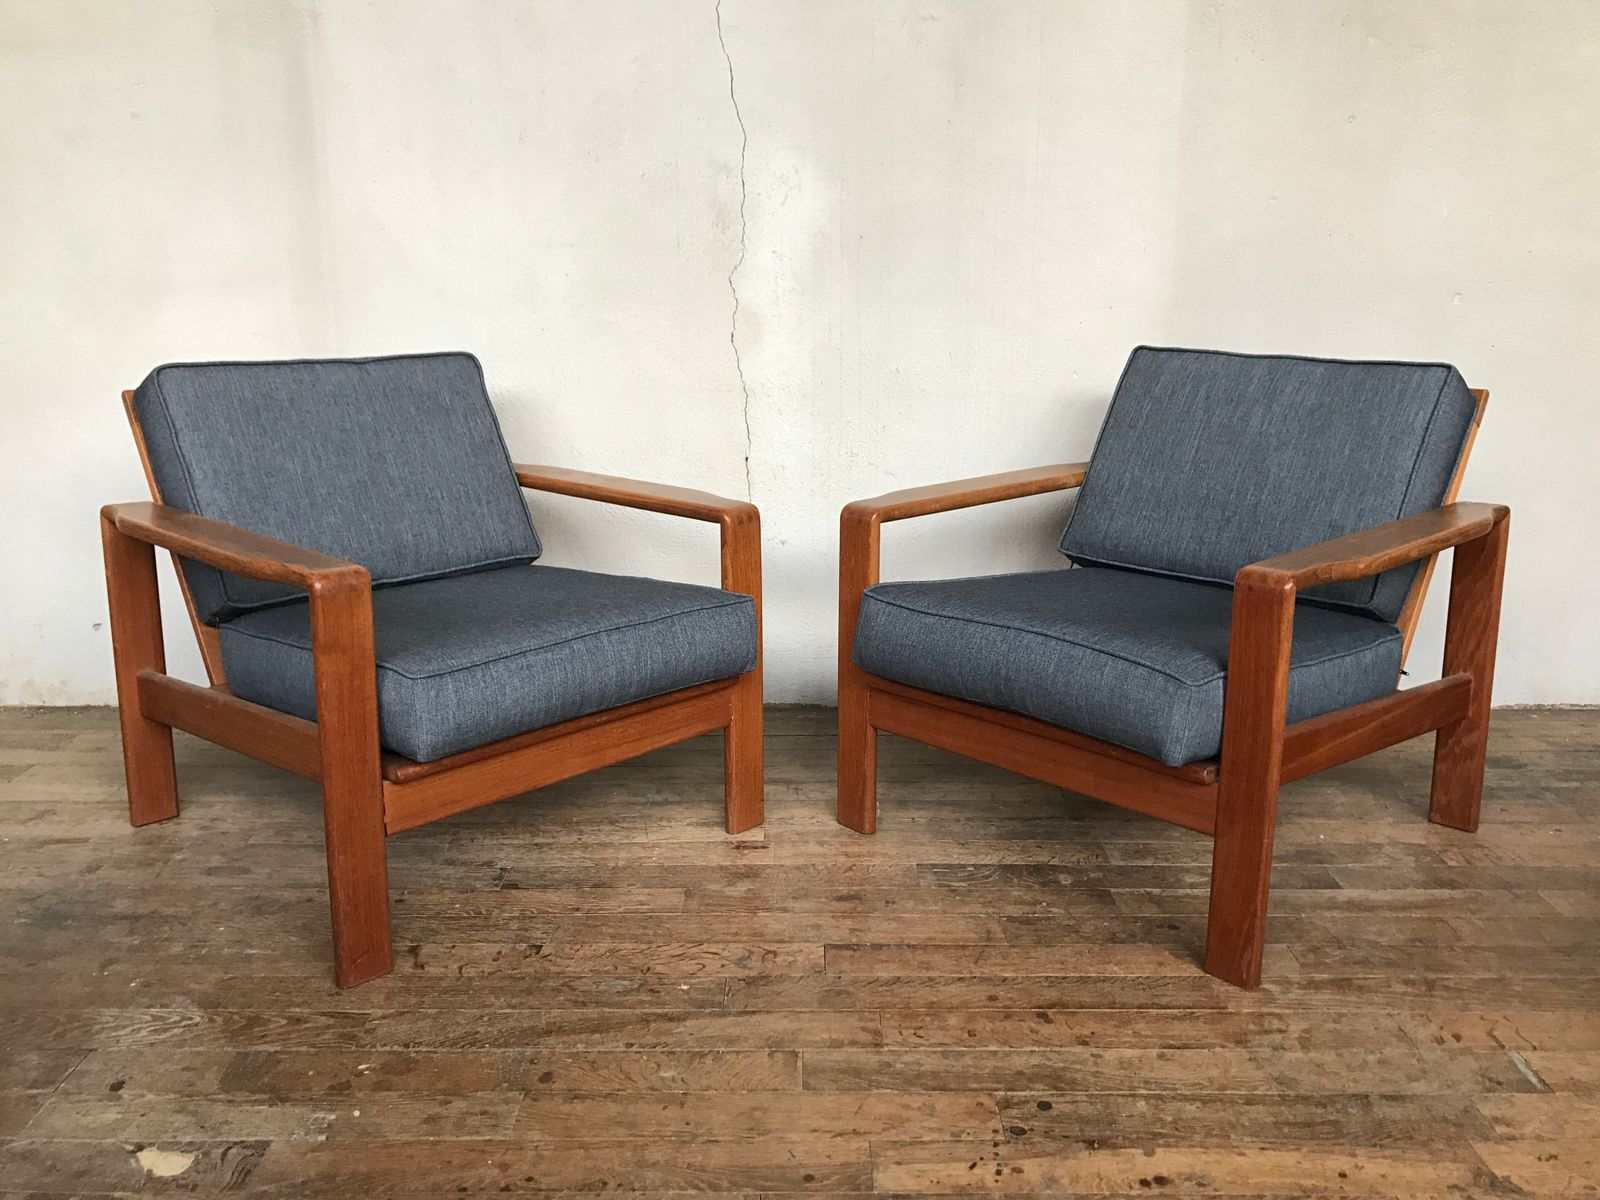 Dänische Vintage Teak Sessel, 2er Set